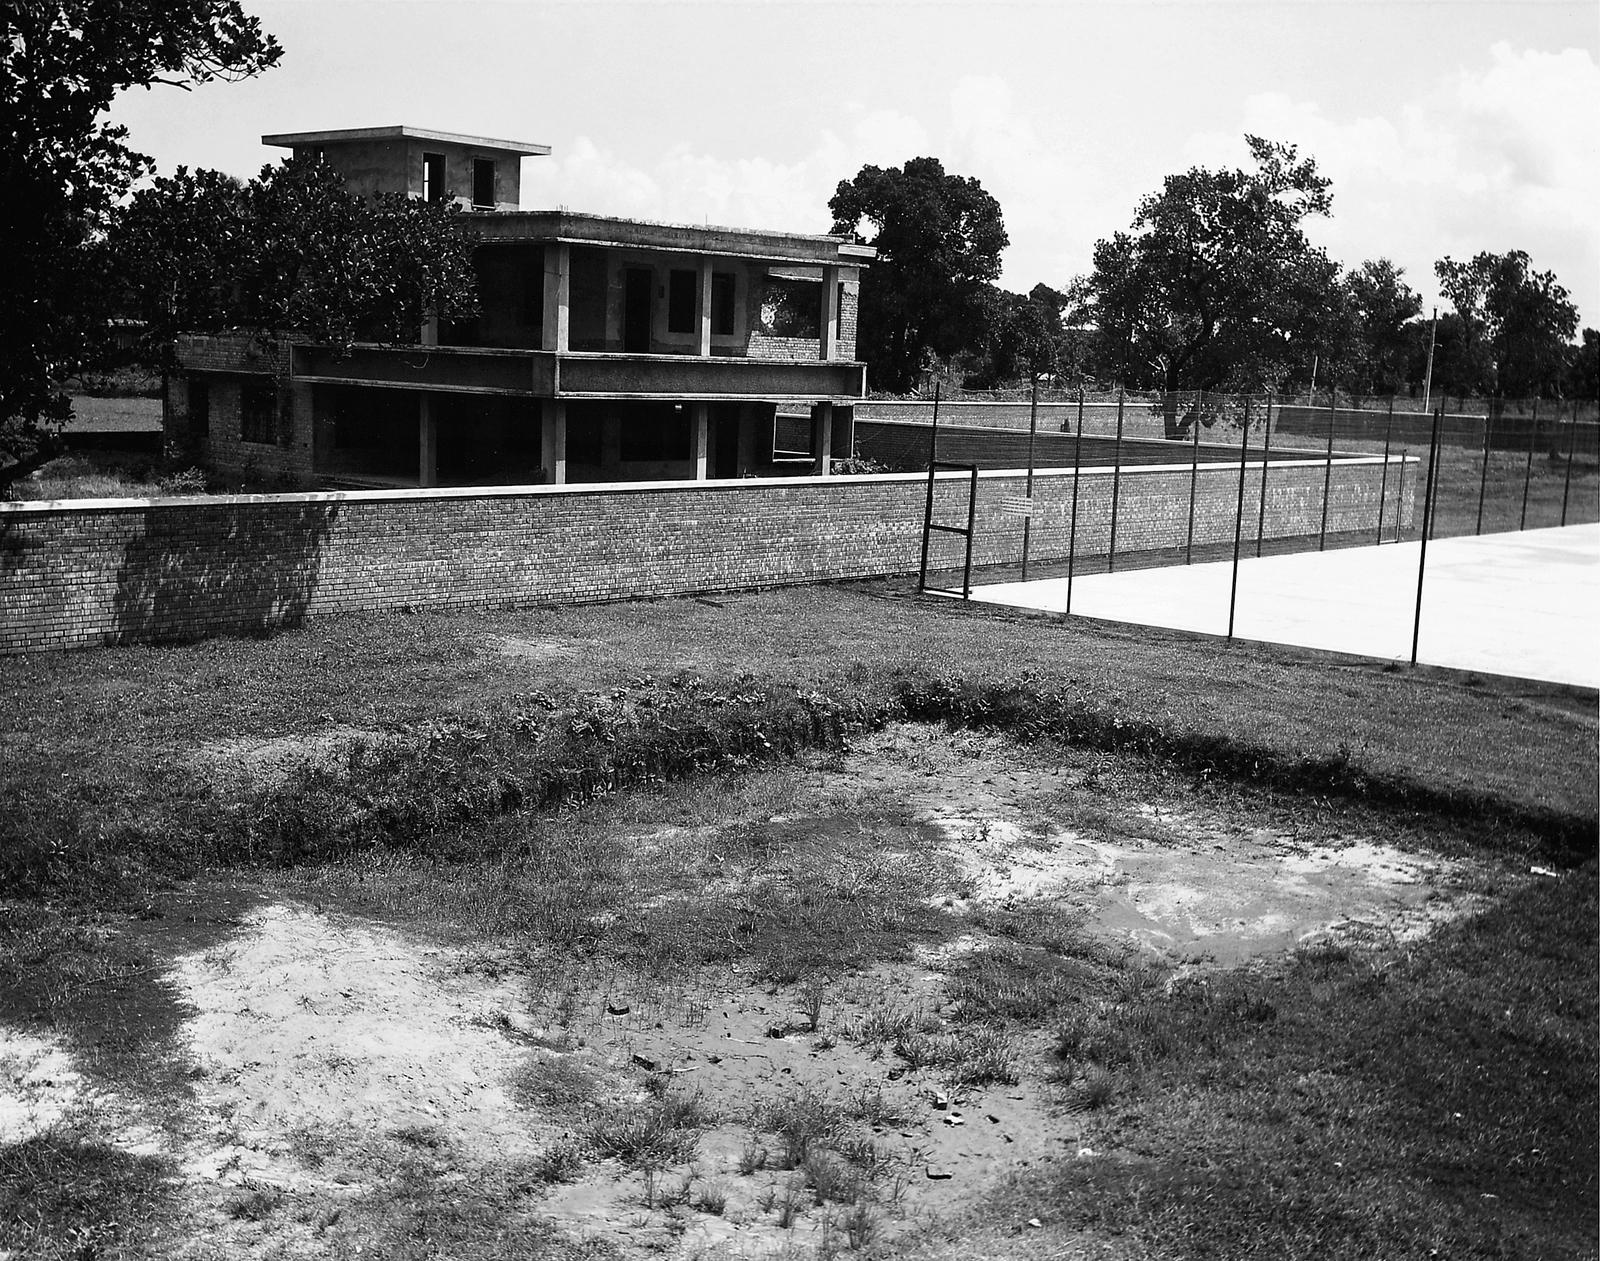 Dhaka - Functional Building Site - 1972